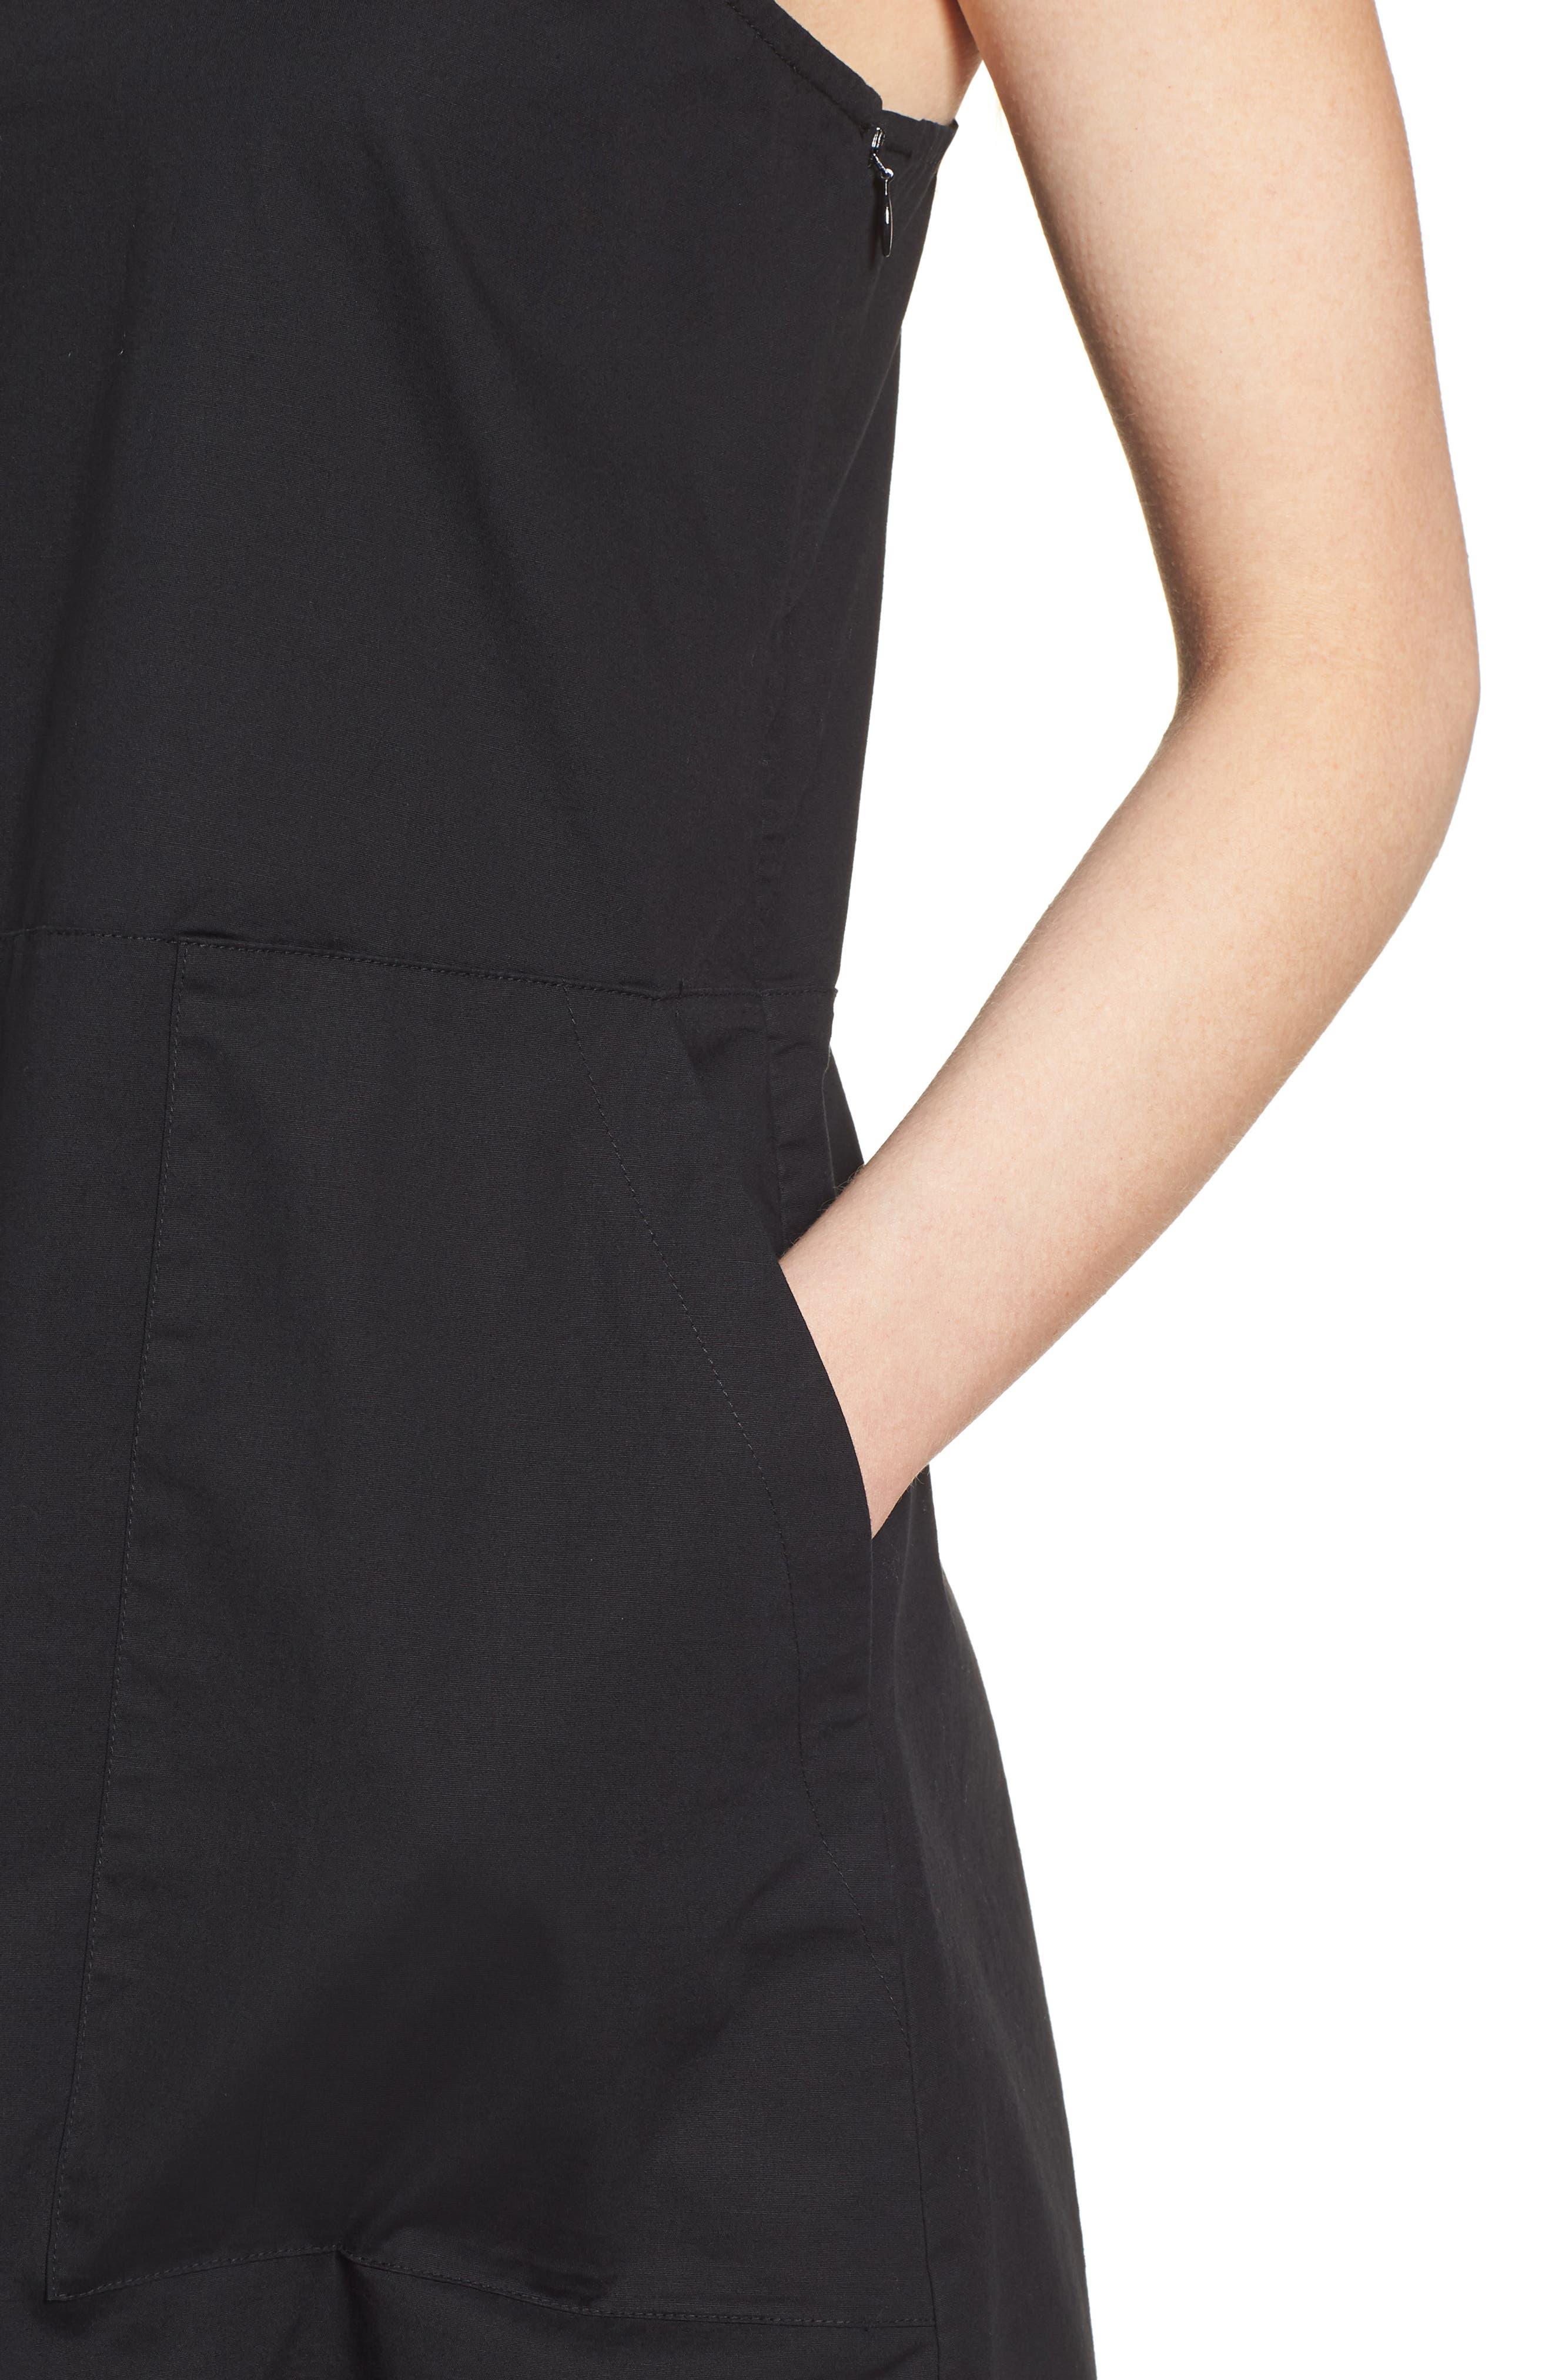 Stretch Organic Cotton Tank Dress,                             Alternate thumbnail 4, color,                             001